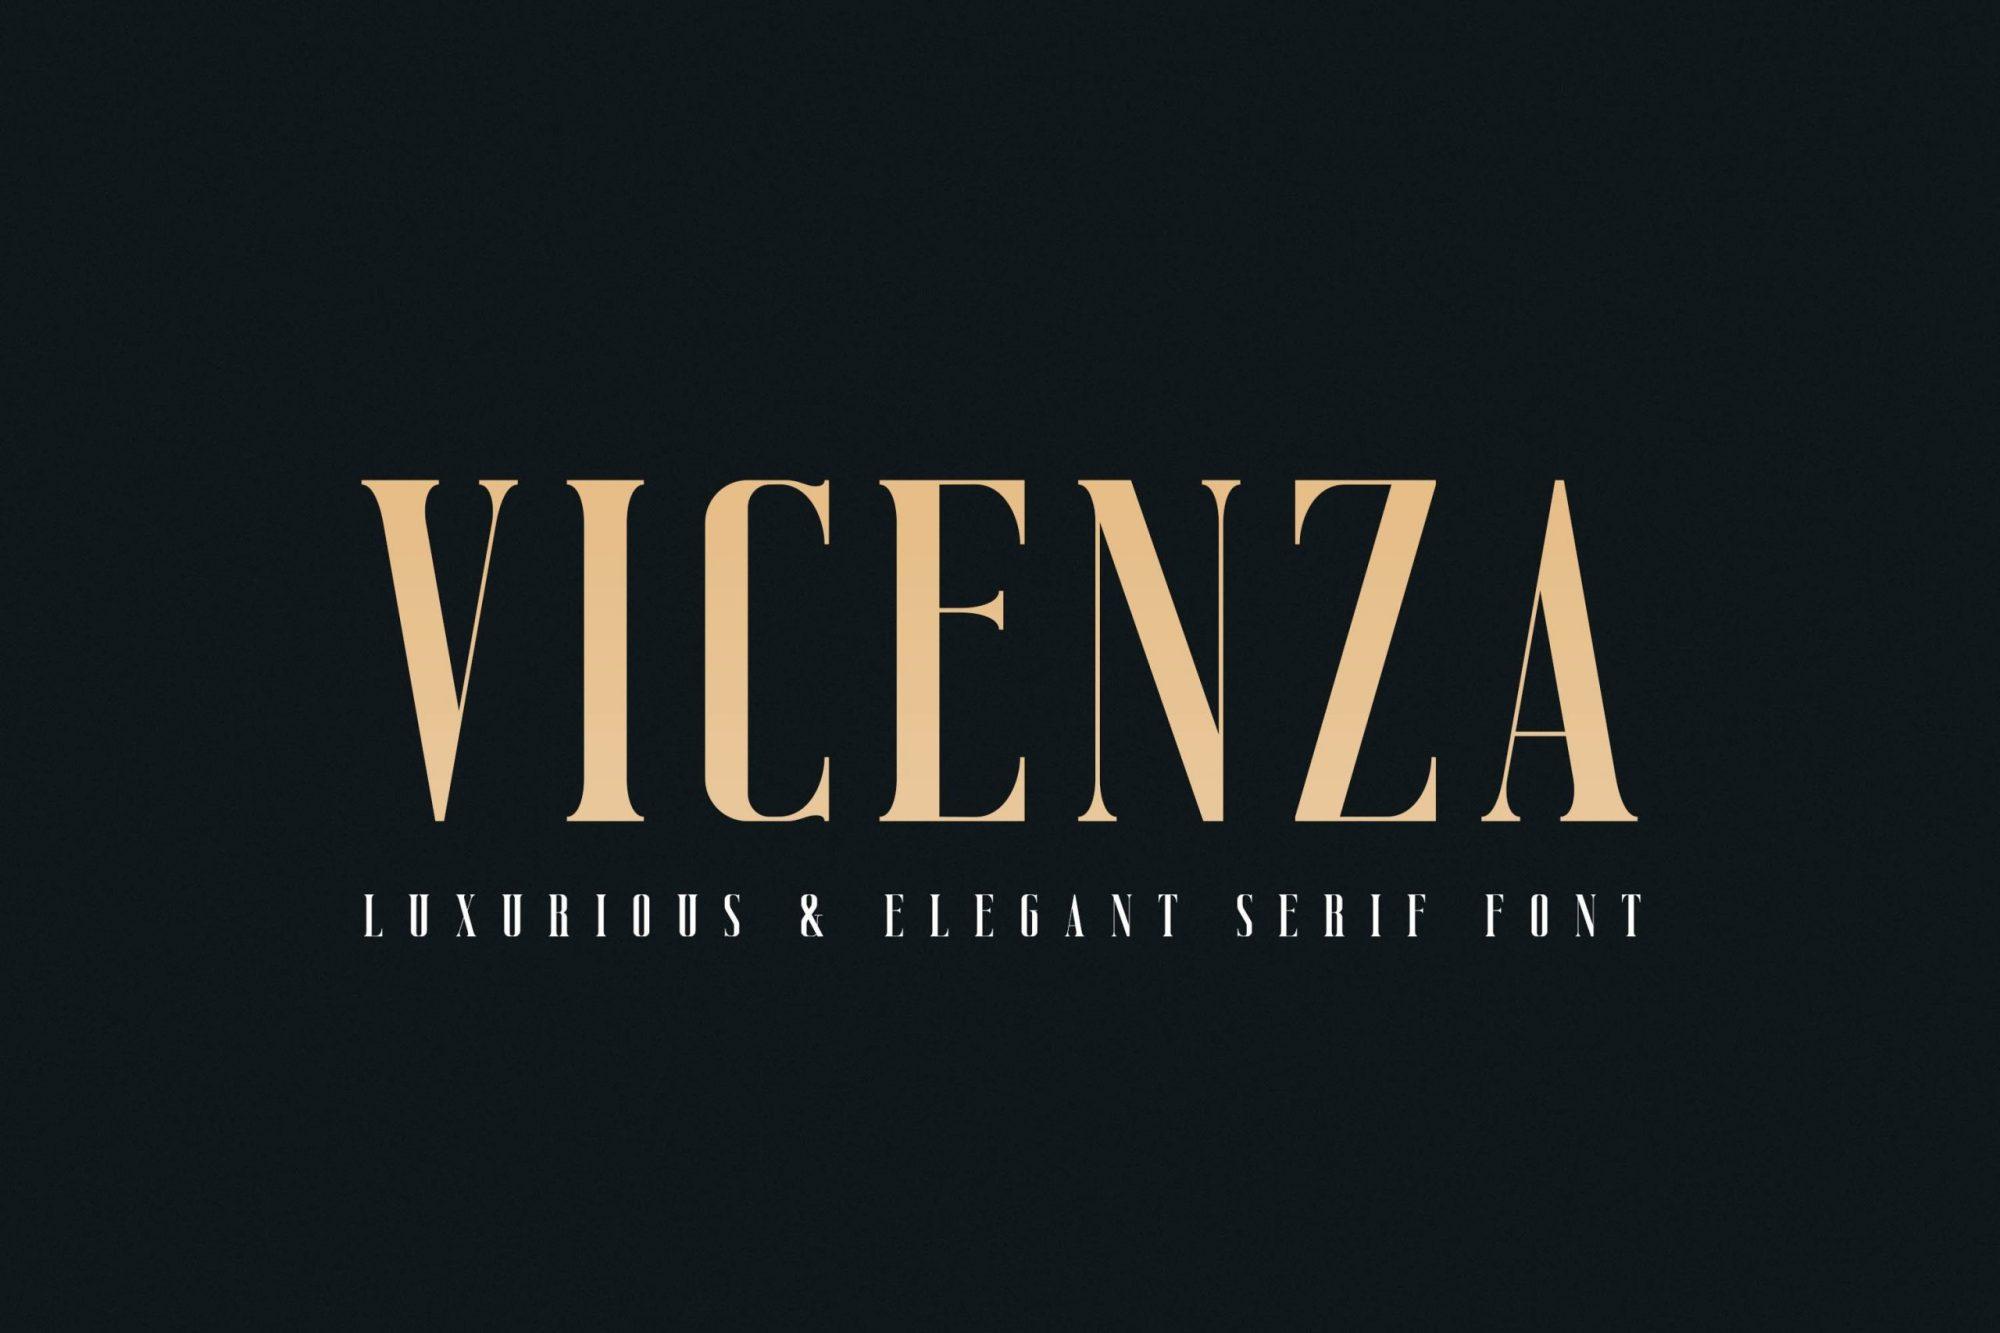 Vicenza Font